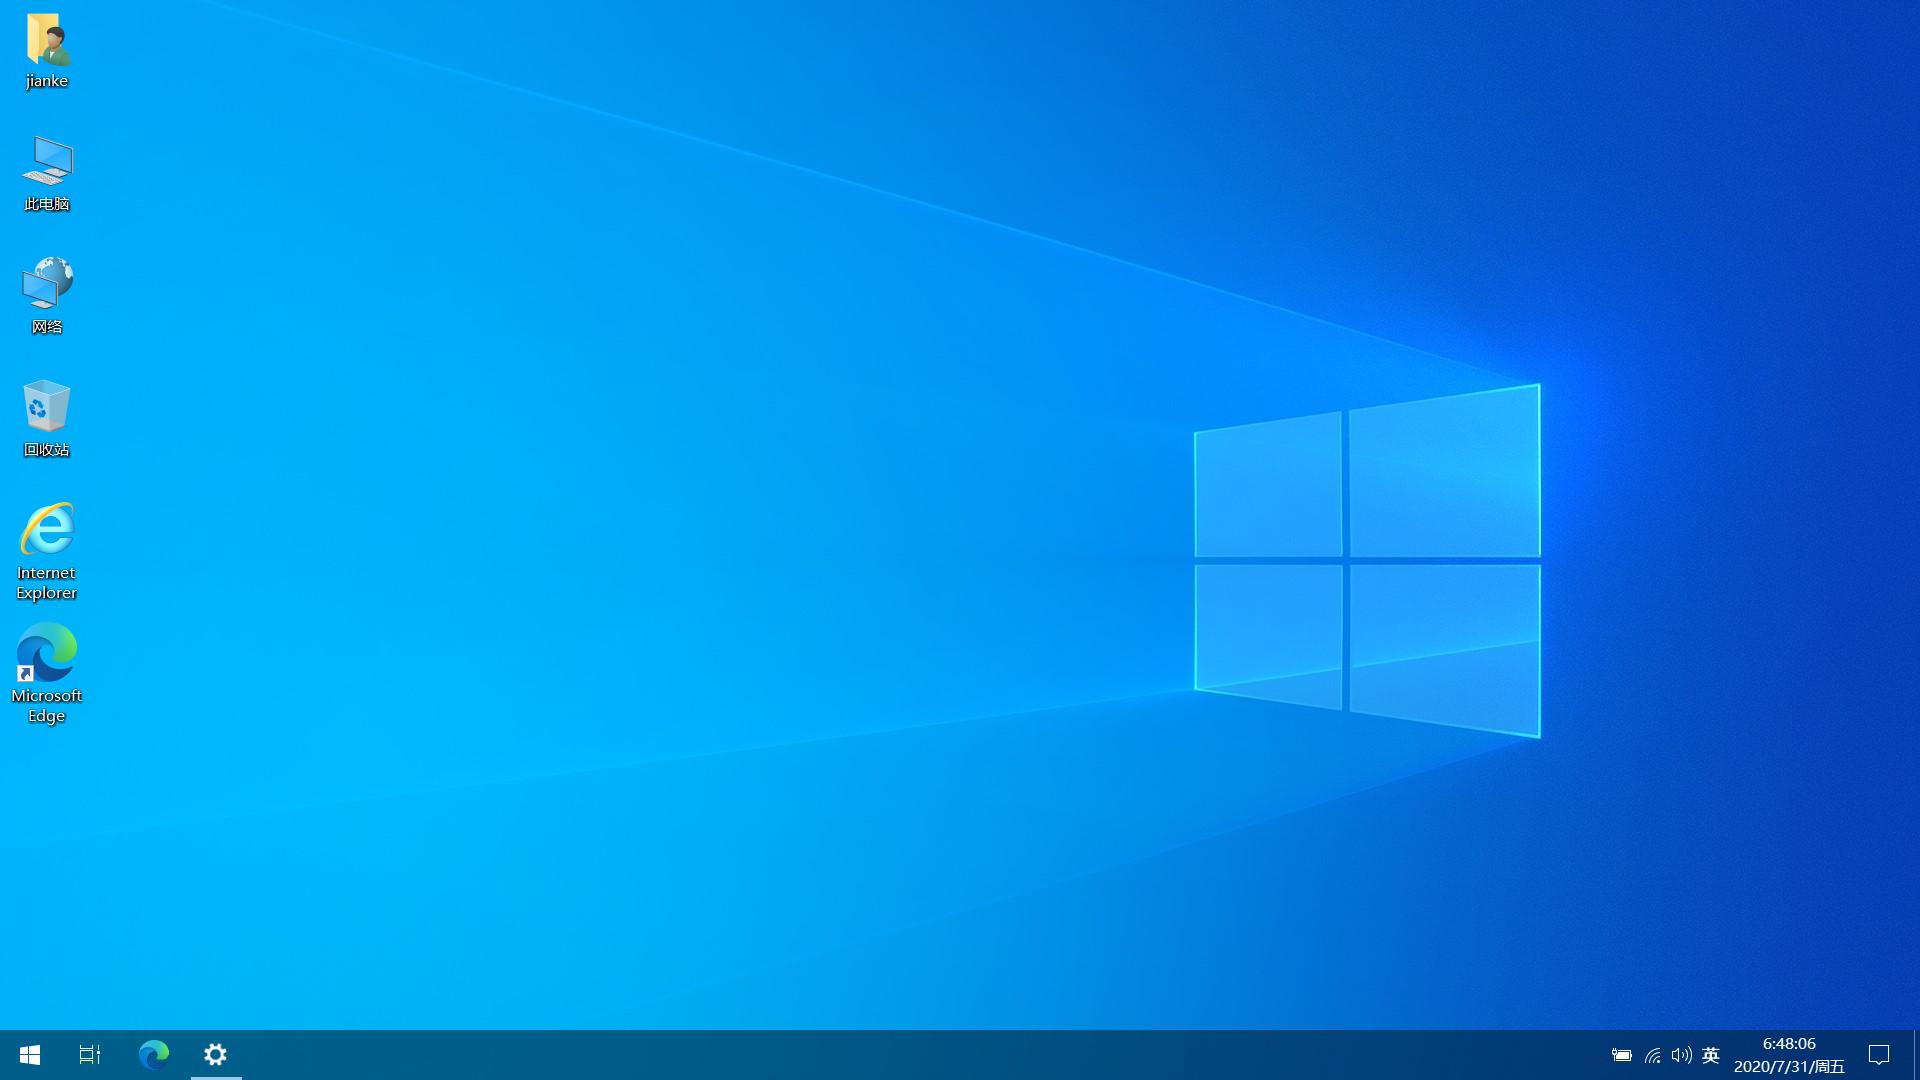 Windows 10(20H2 19042.421)YLX精简优化版